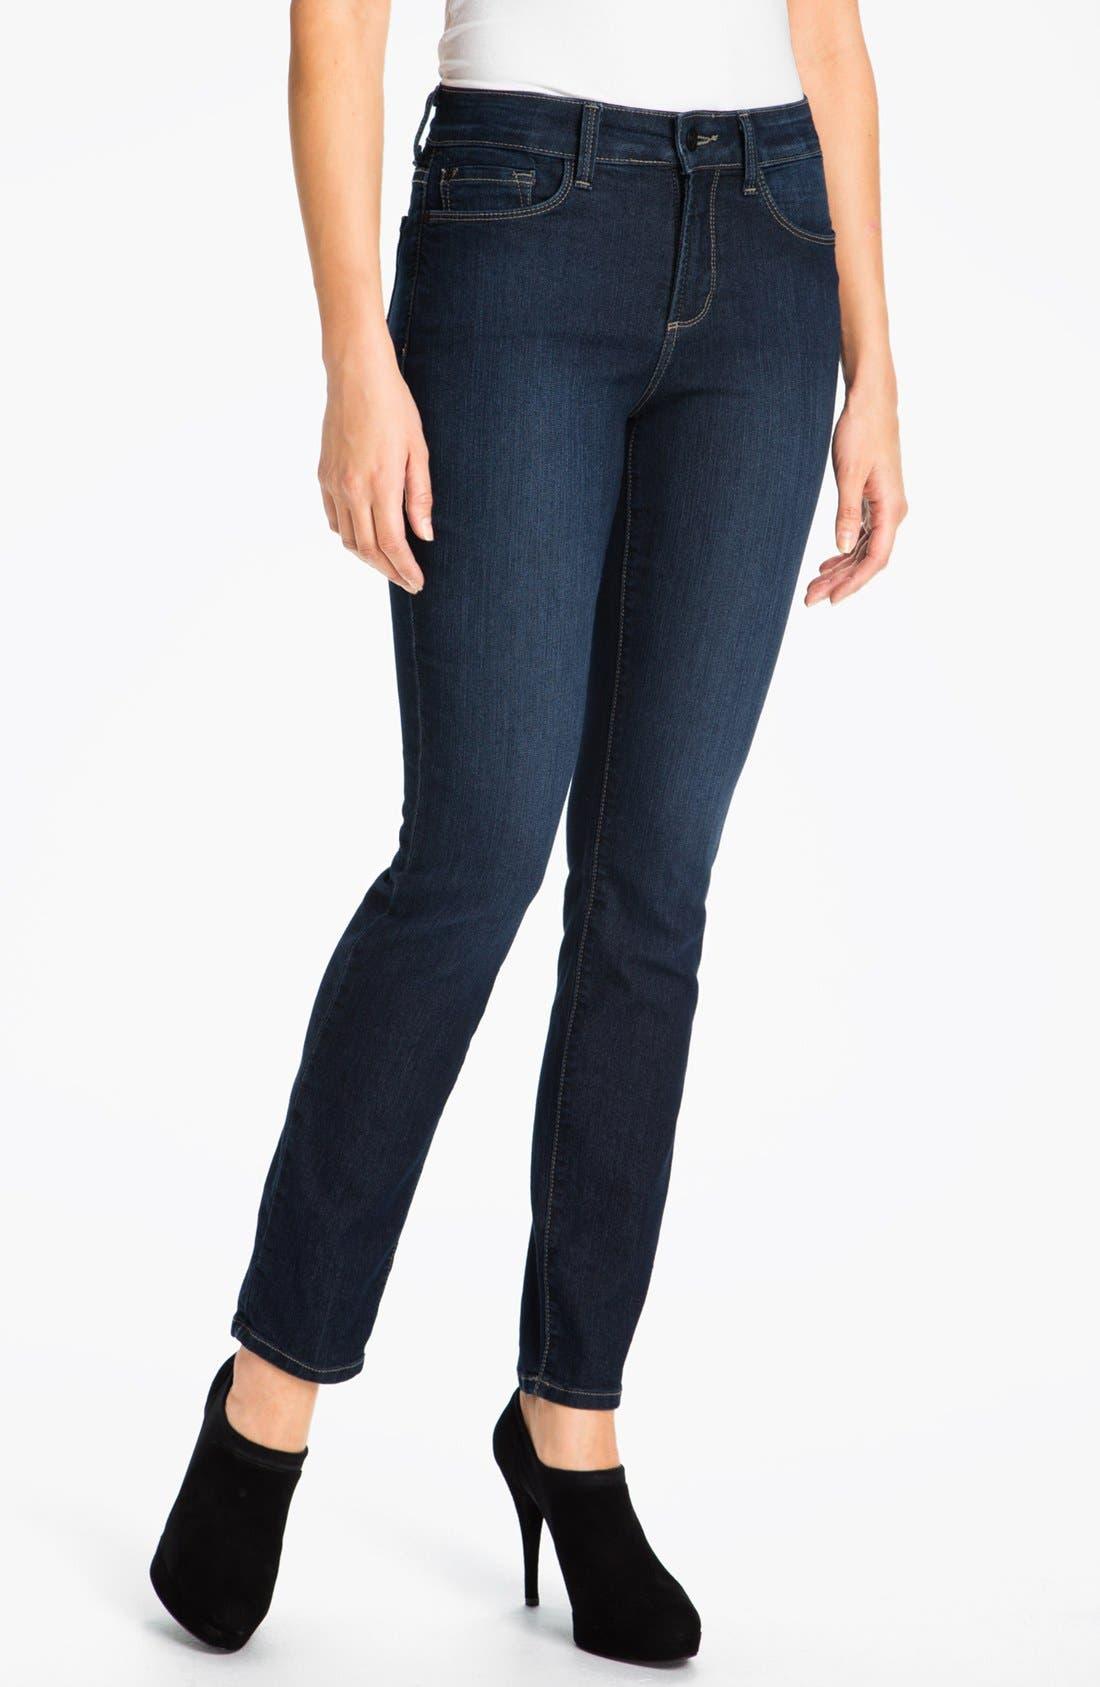 NYDJ 'Alina' Stretch Skinny Jeans (Hollywood) | Nordstrom